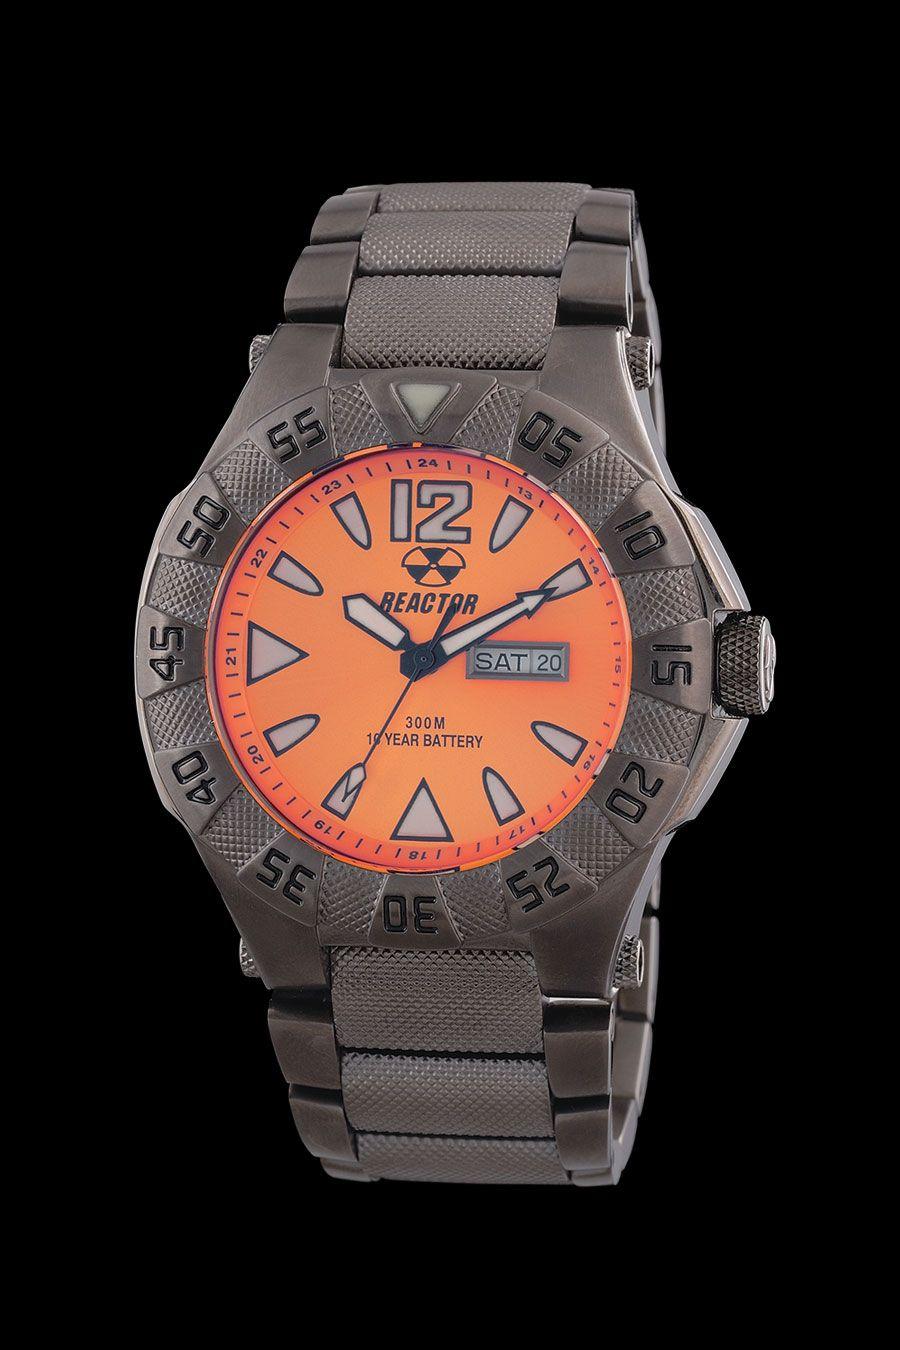 REACTOR 53608 GAMMA 500.00 Watches for men, Horology